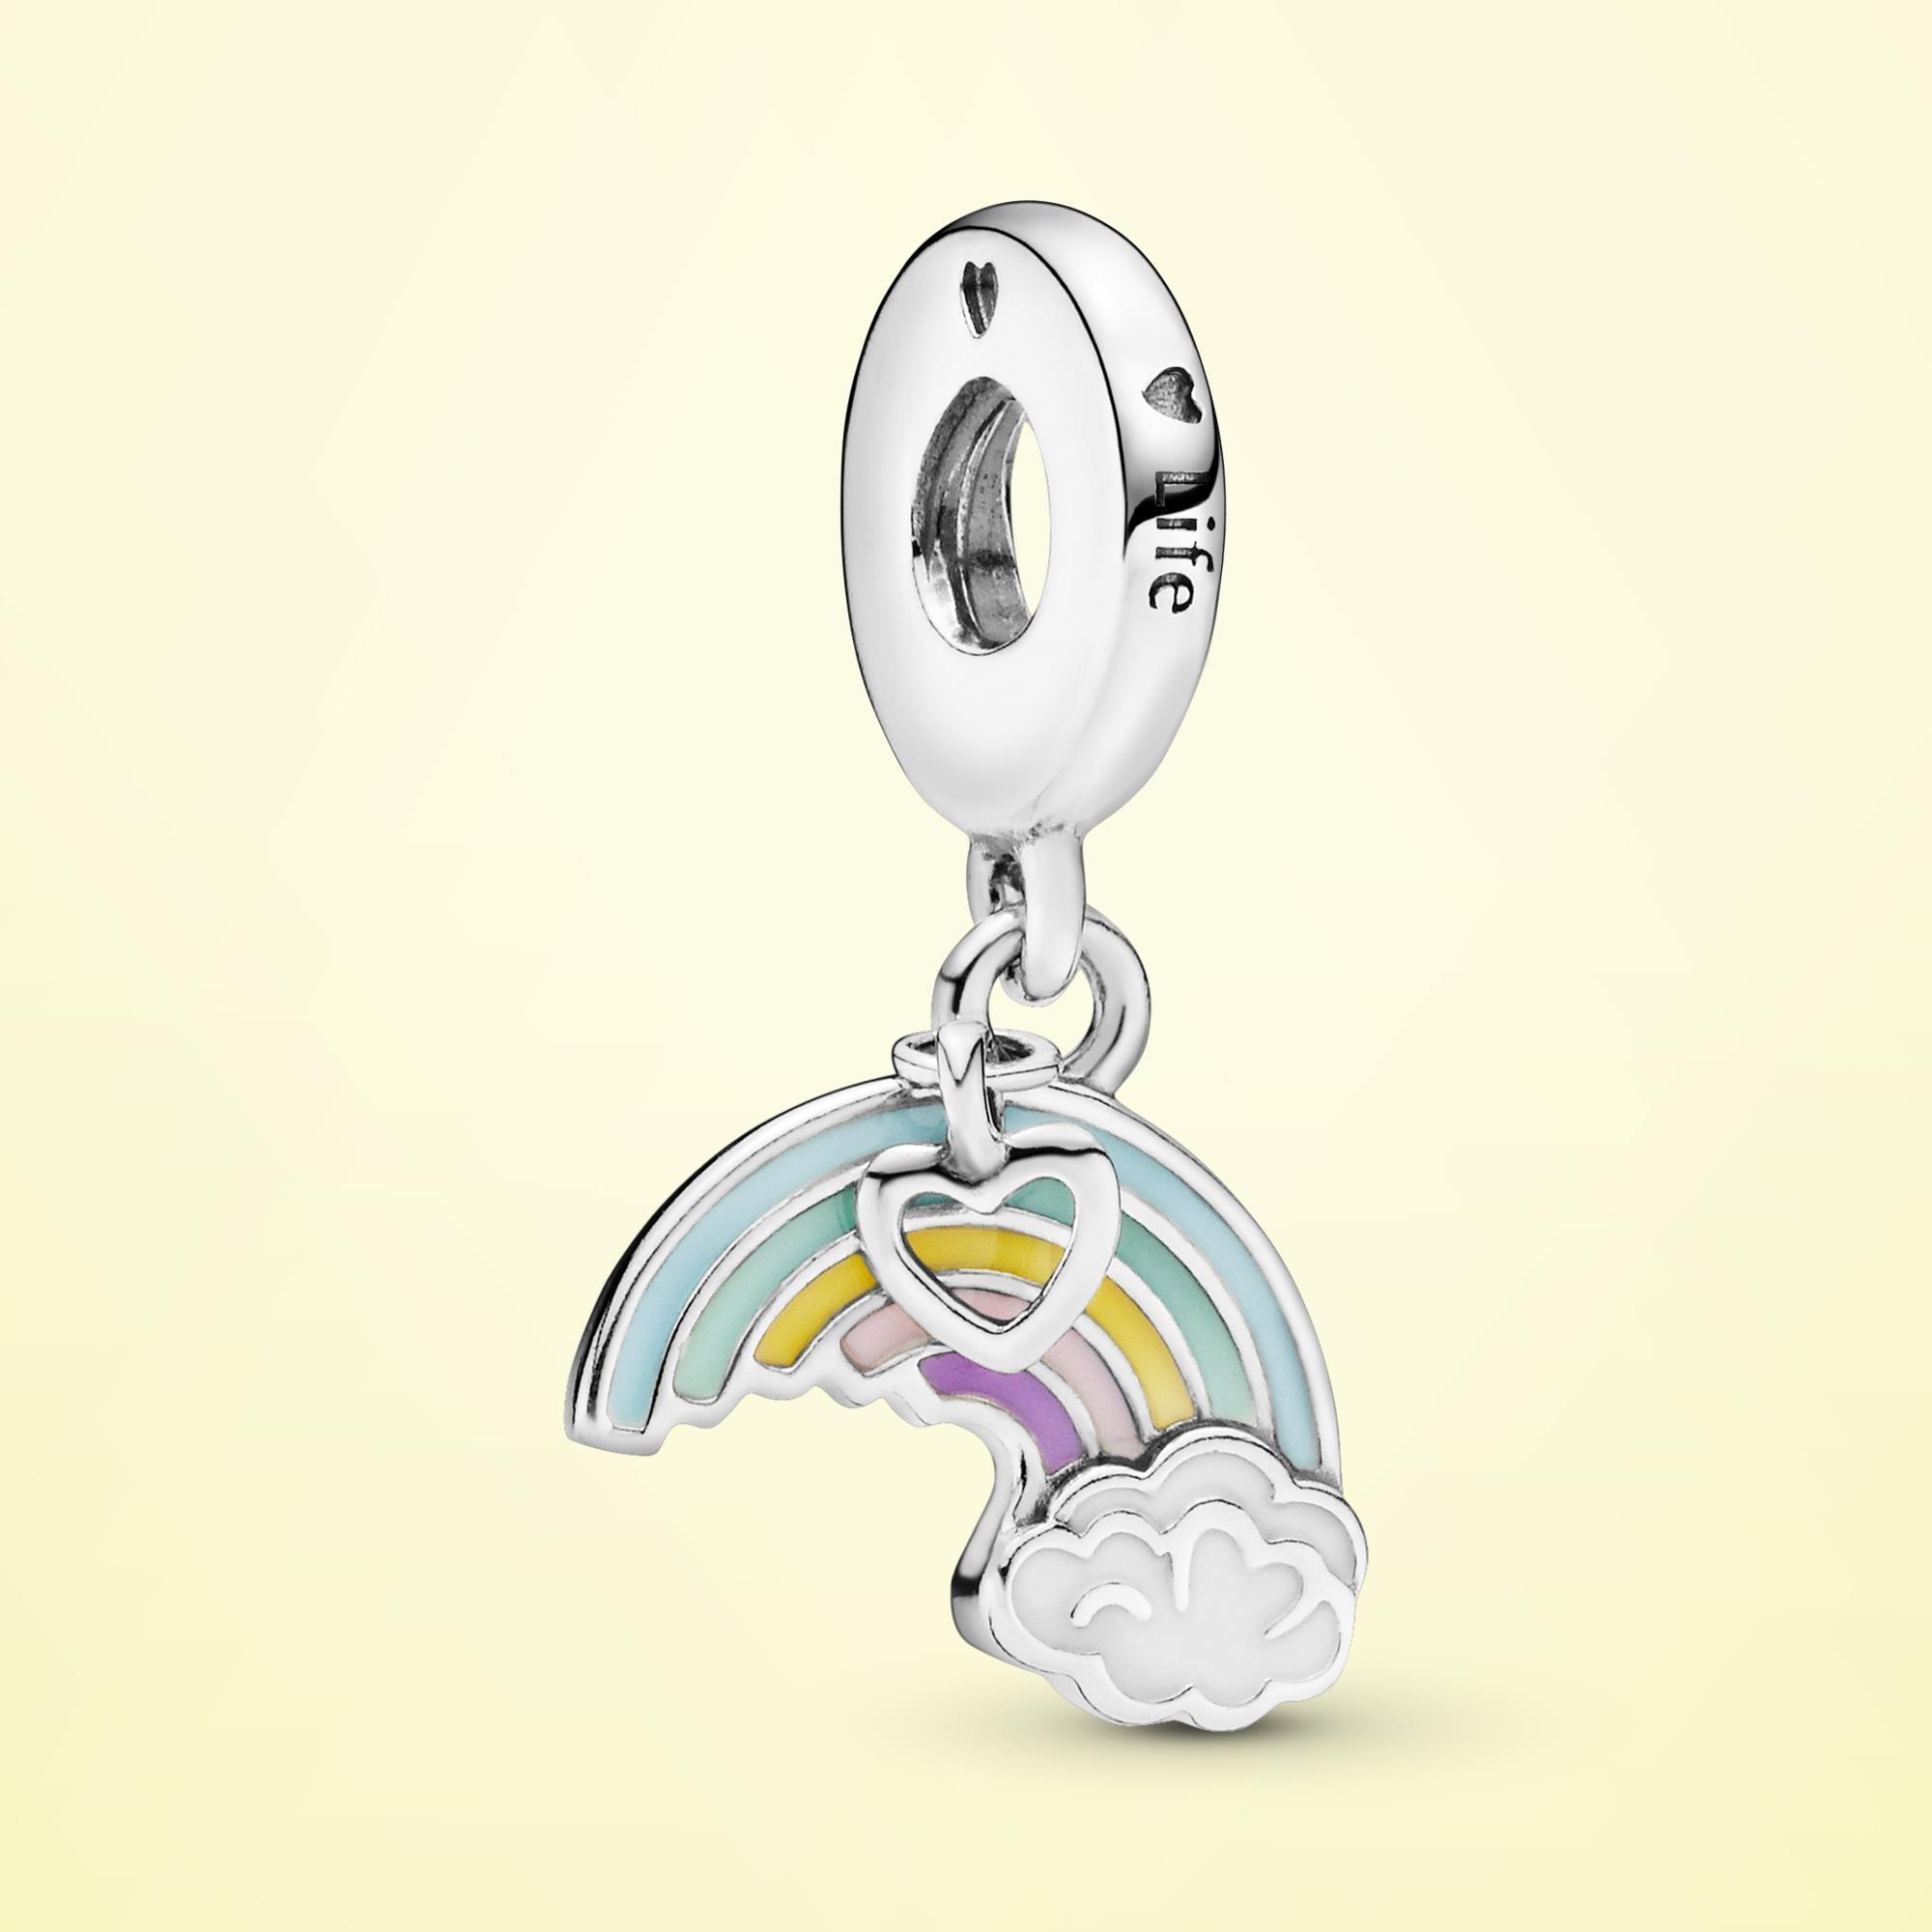 925 Sterling Silver Rainbow and Cloud Dangle Charm Beads Fit Original Pandora Bracelet S925 Jewelry wholesale  PTC115